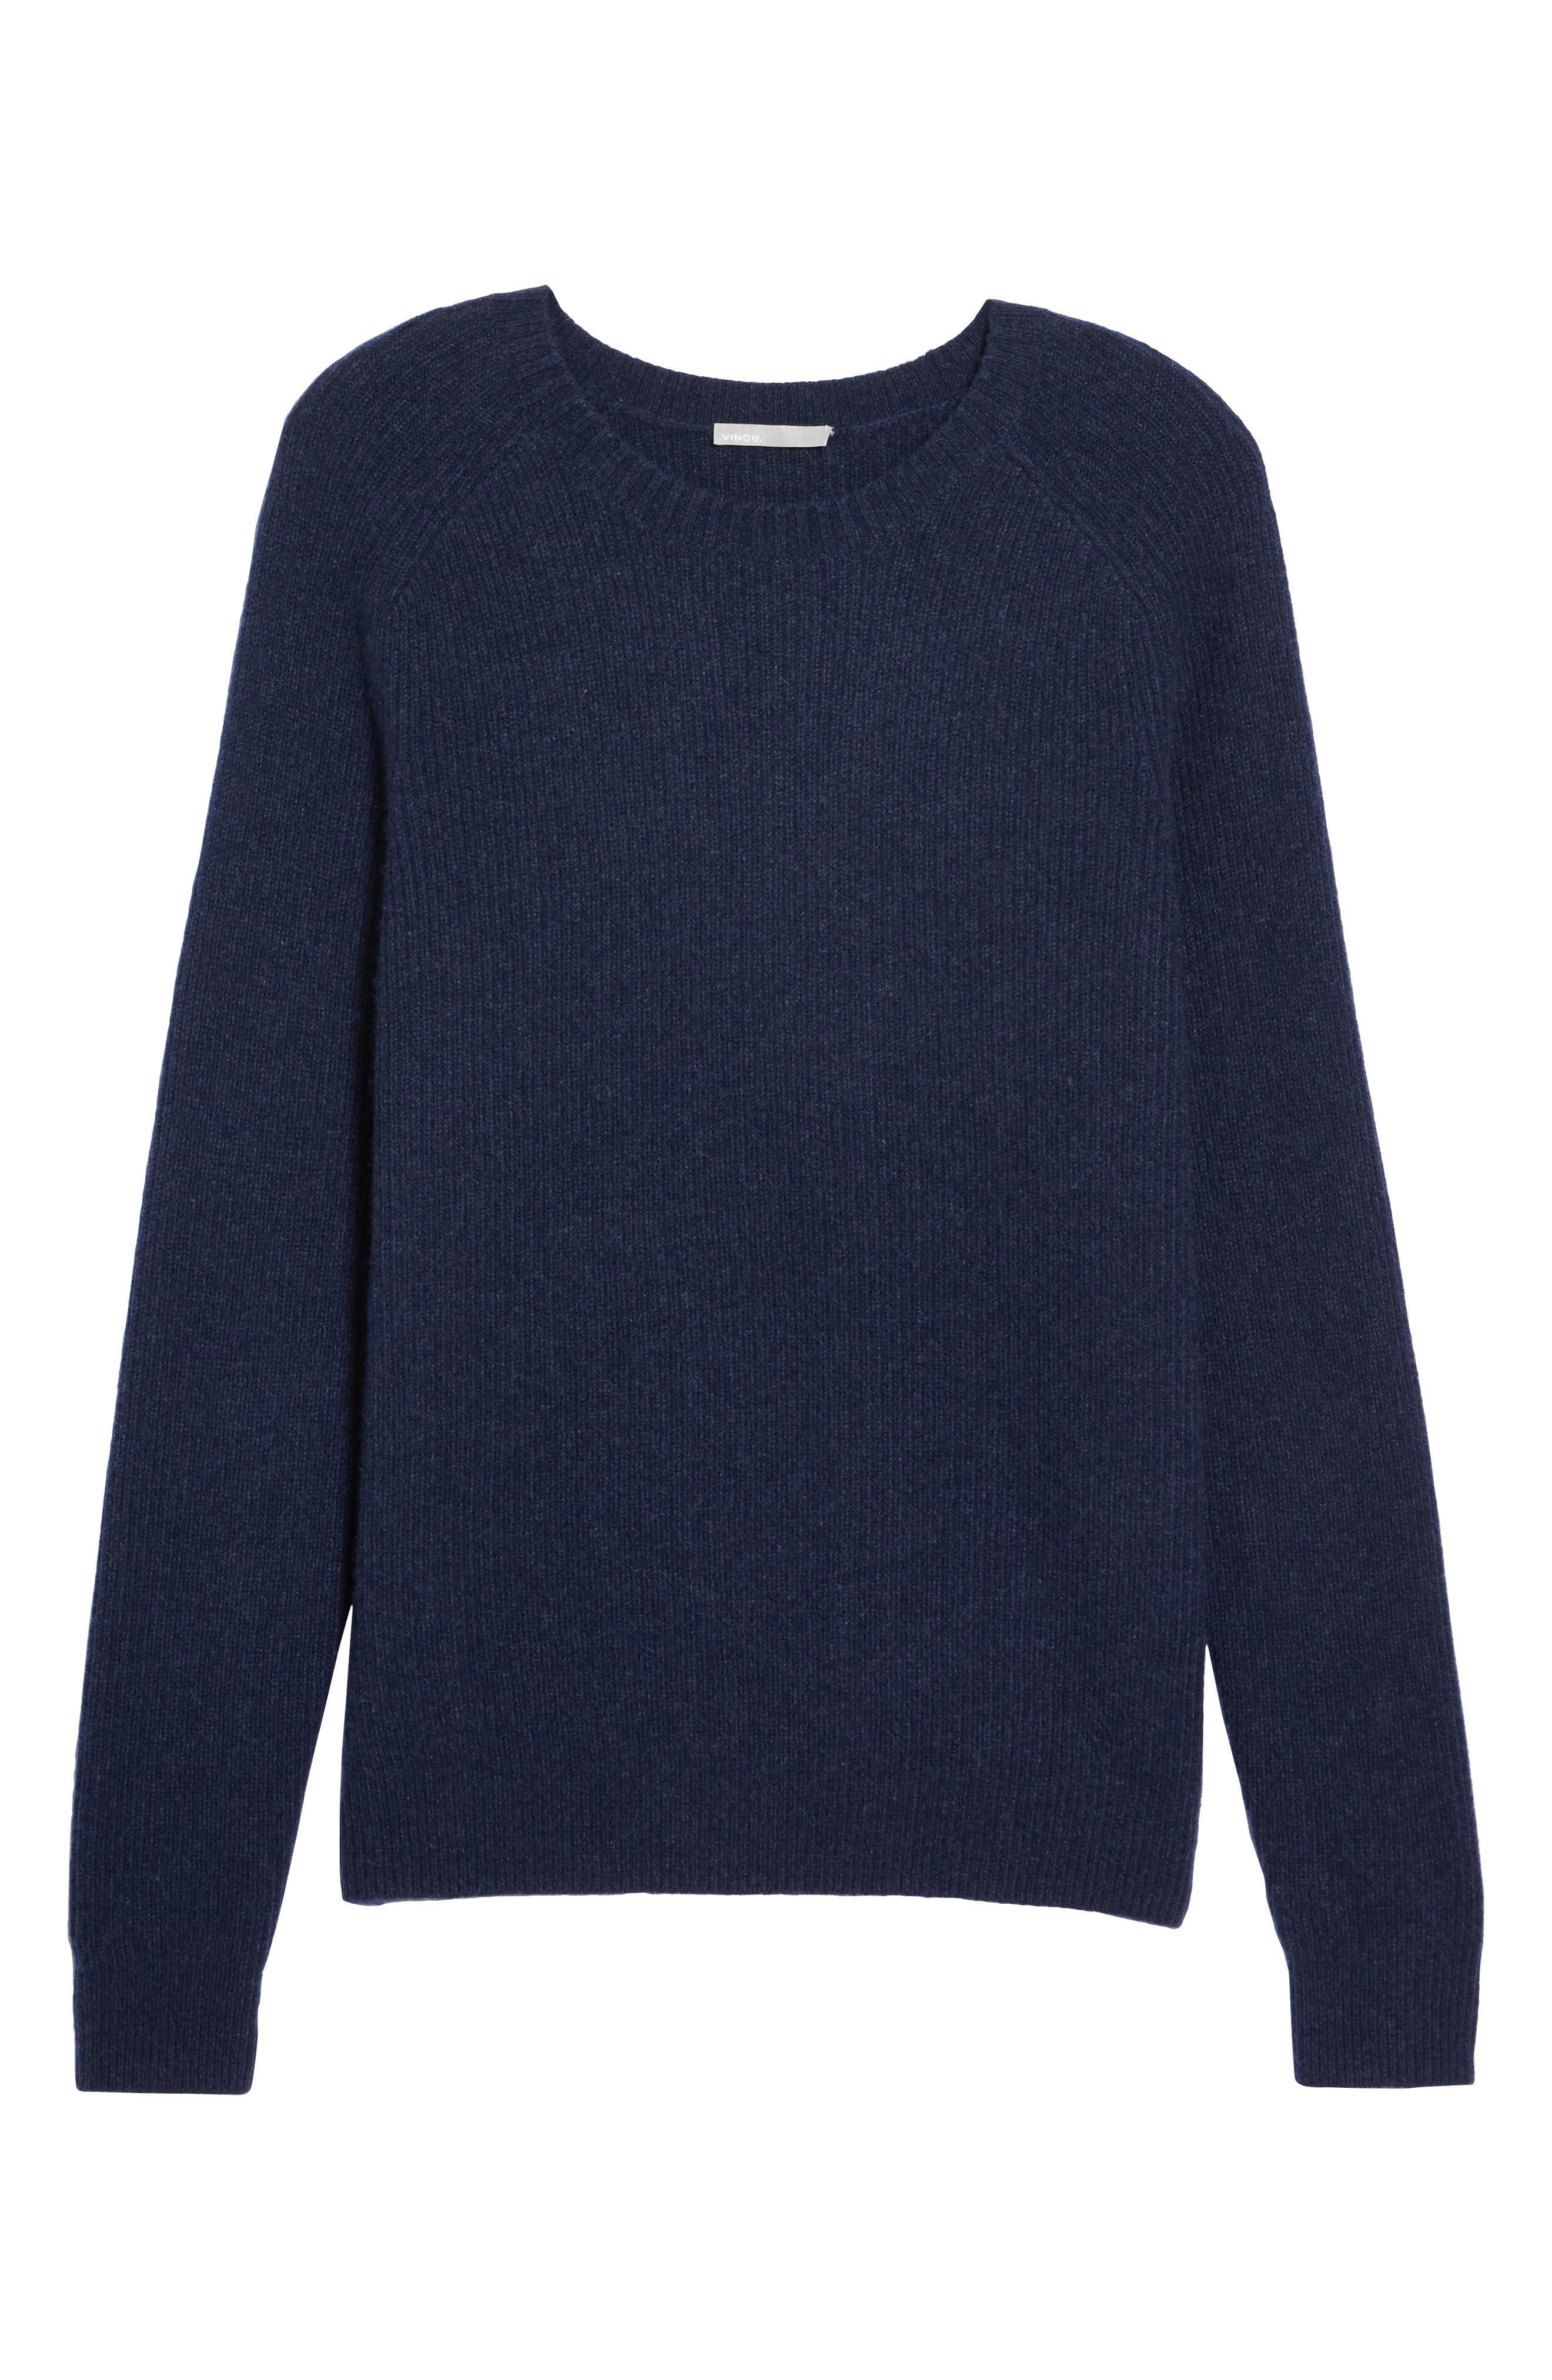 Ribbed Wool & Cashmere Raglan Sweater,                             Alternate thumbnail 5, color,                             Coastal